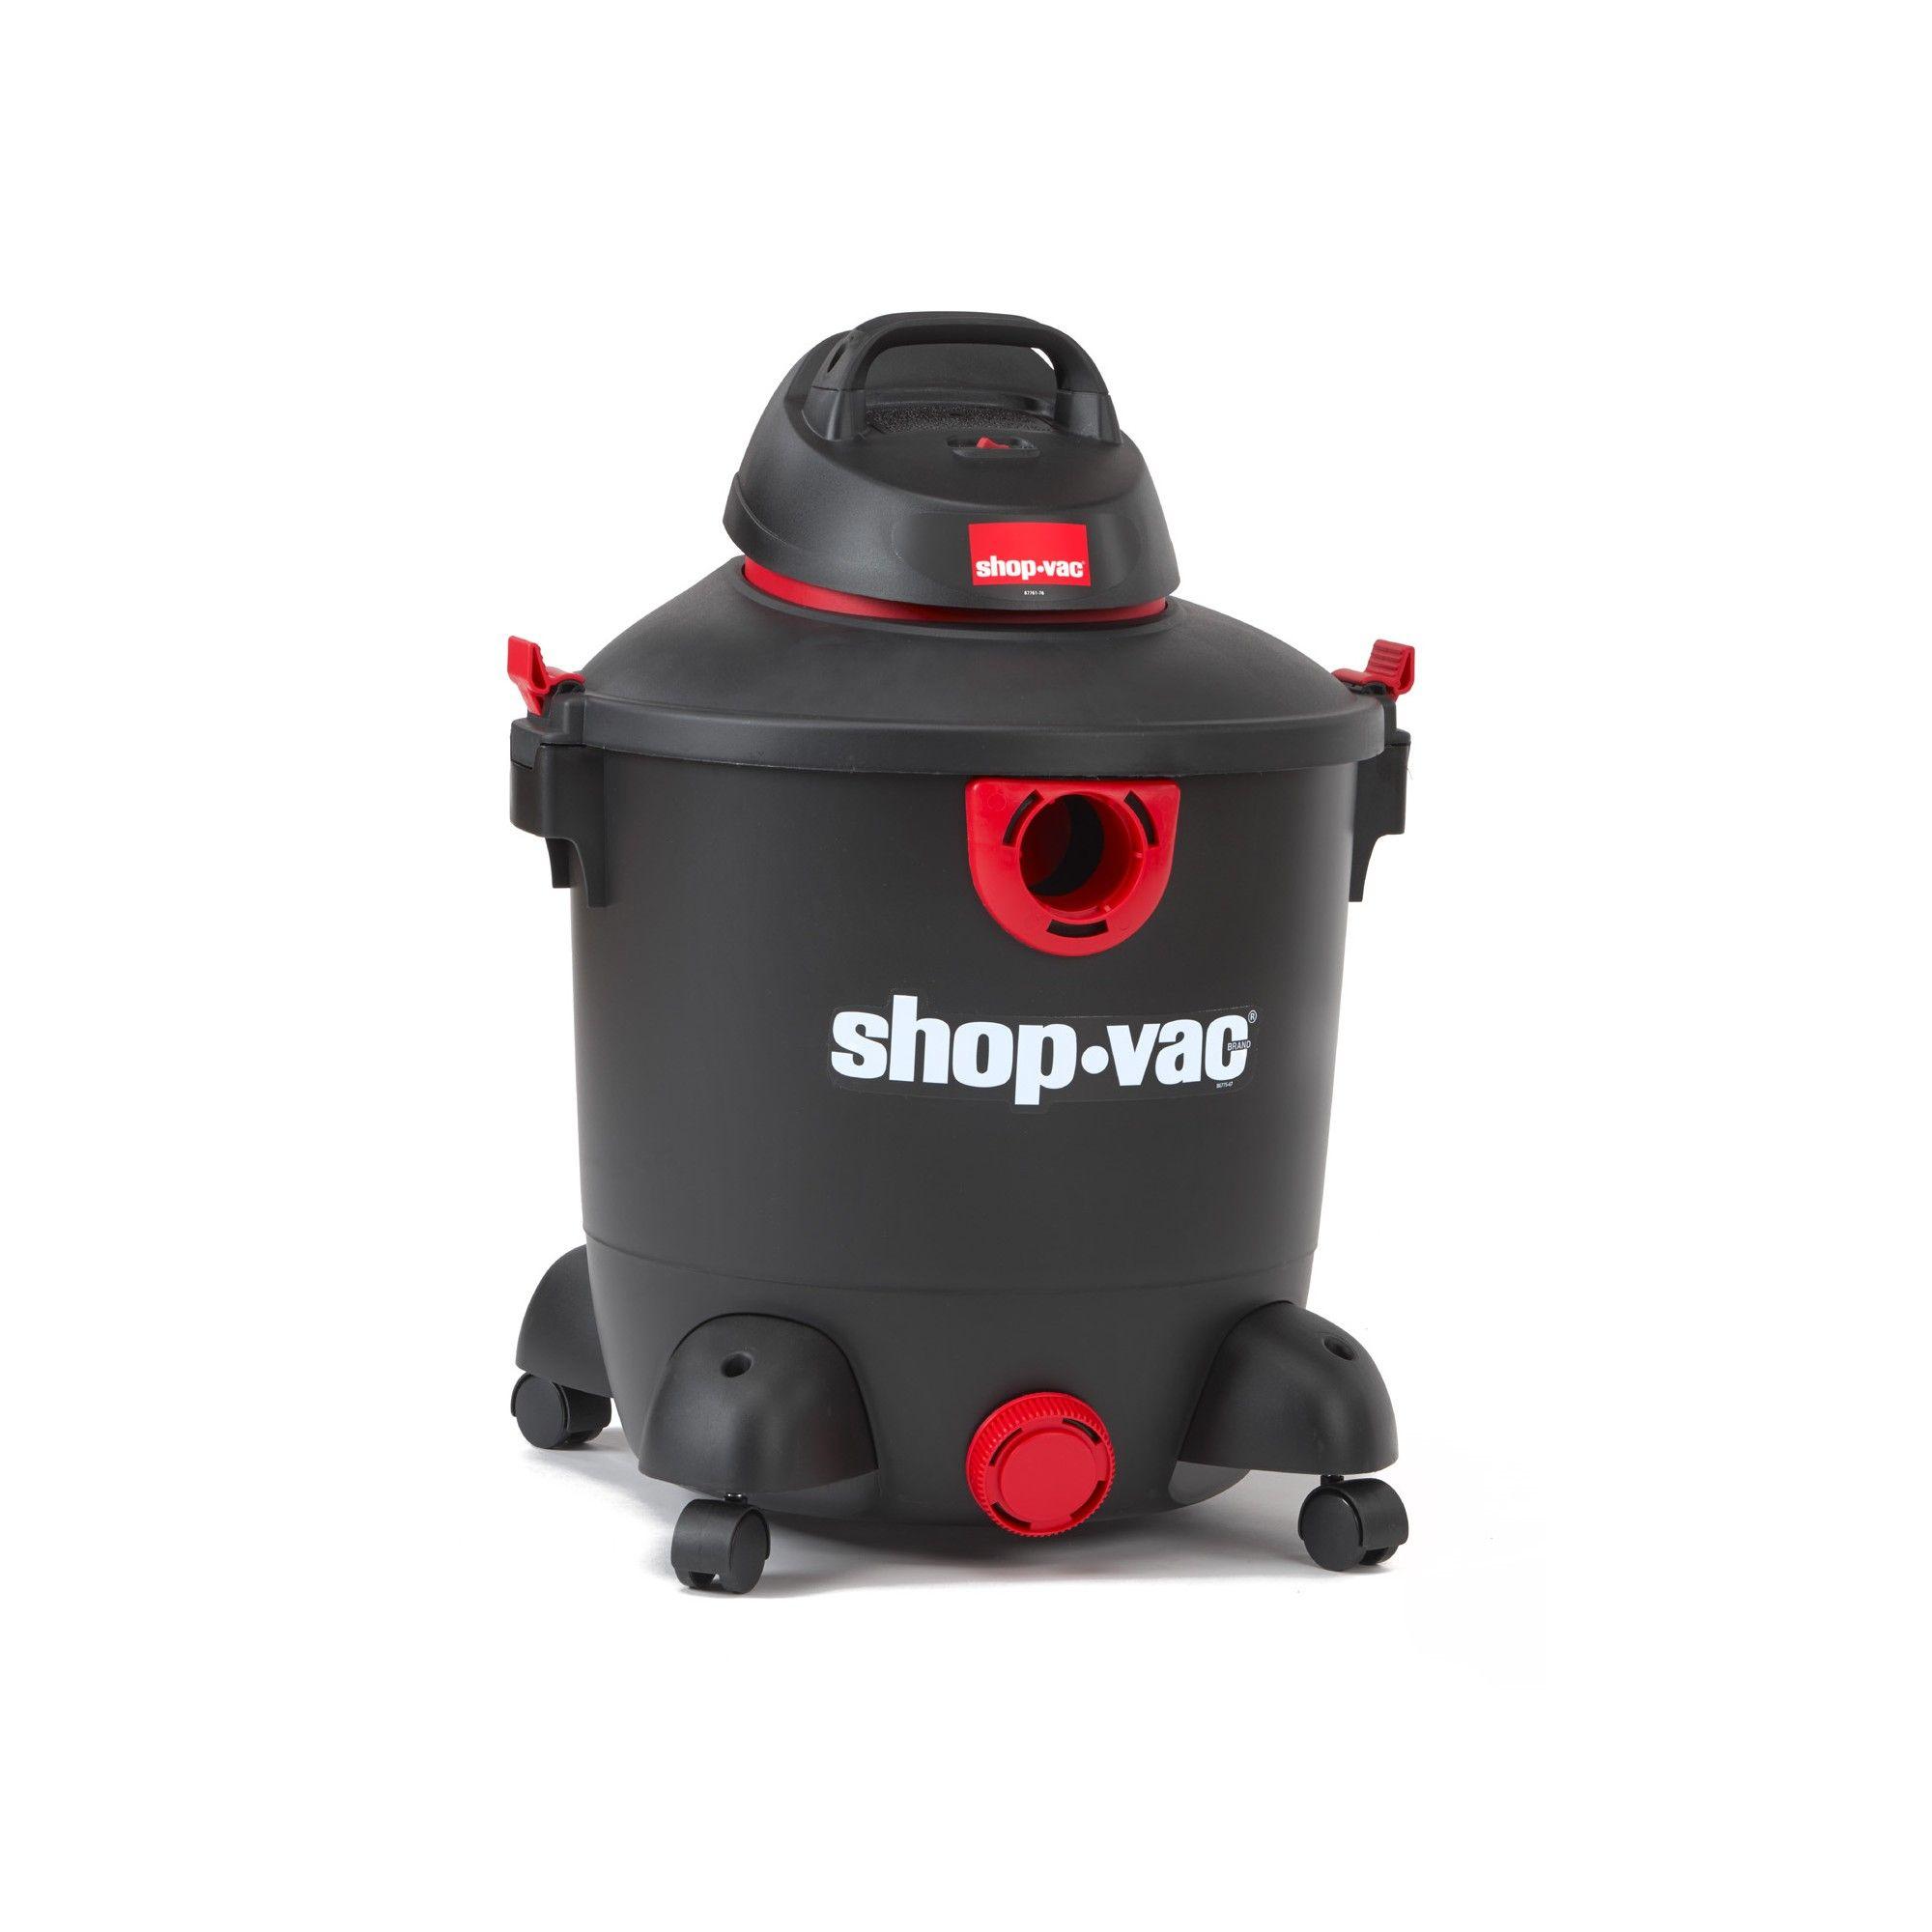 2 ton küchenideen shopvac gal  peak hp wetdry vac  black in   products